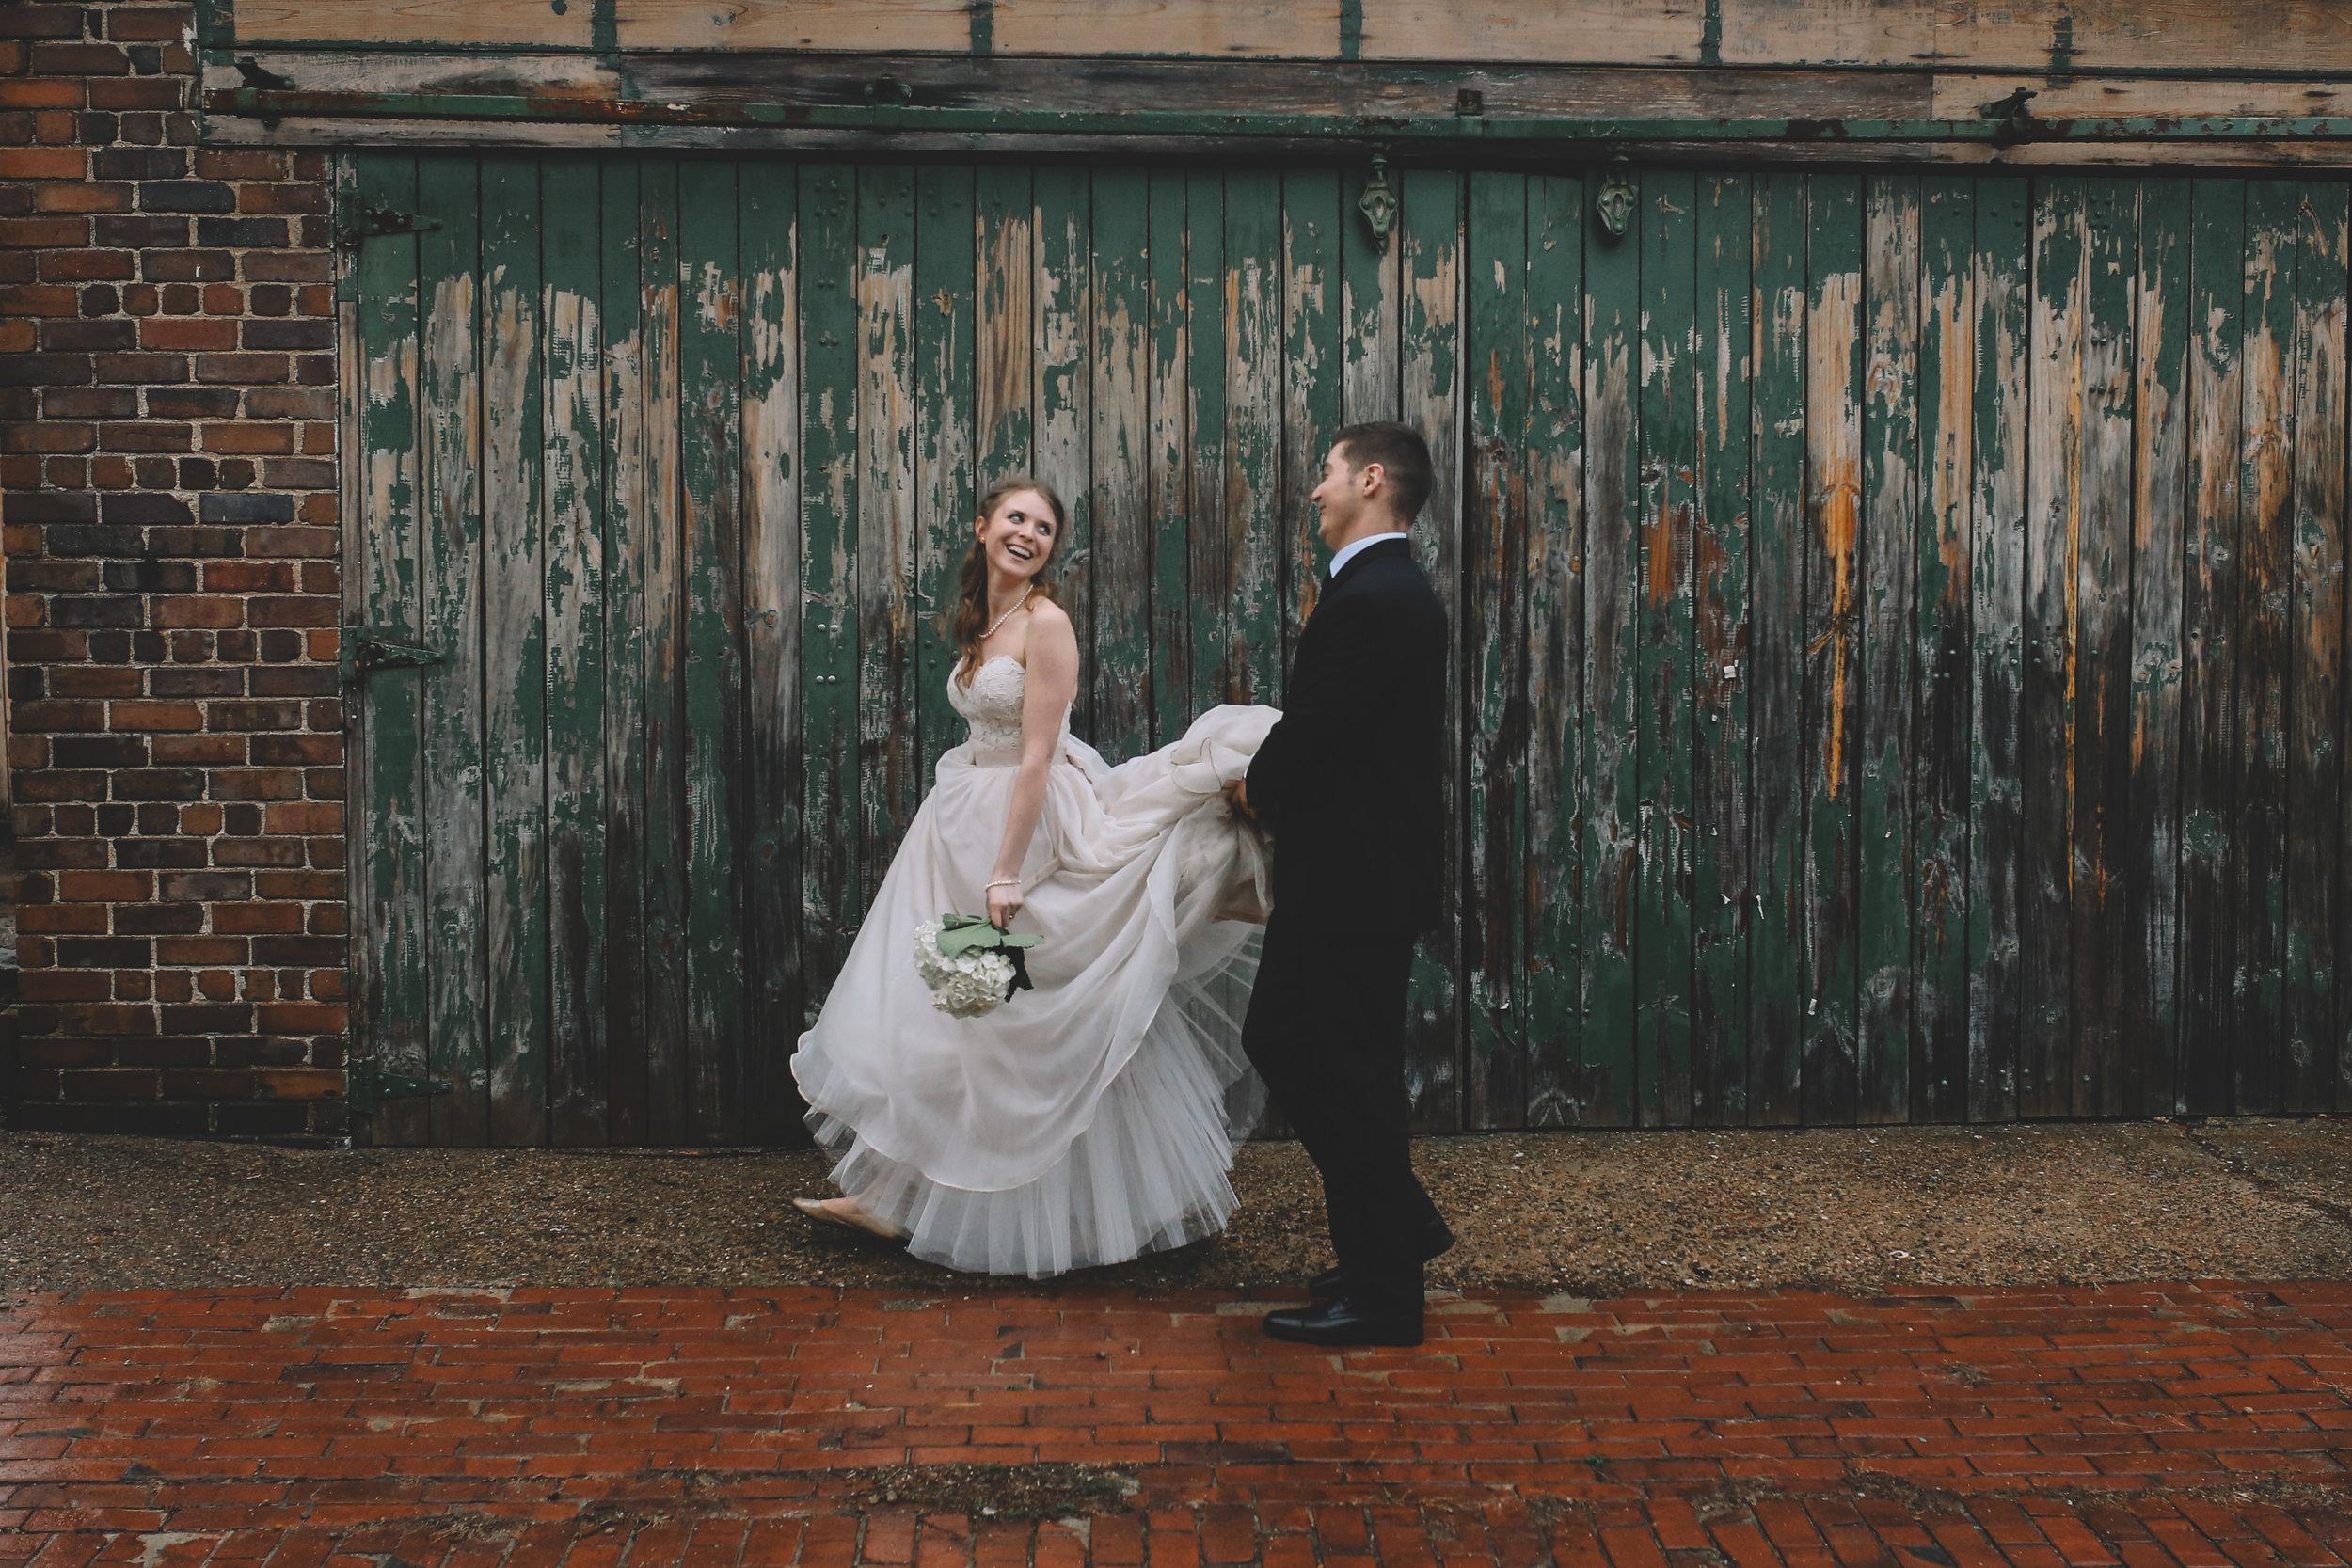 Jake + Brittney Balbas Airbnb Carriage House Wedding Evansville IN (300 of 426).jpg